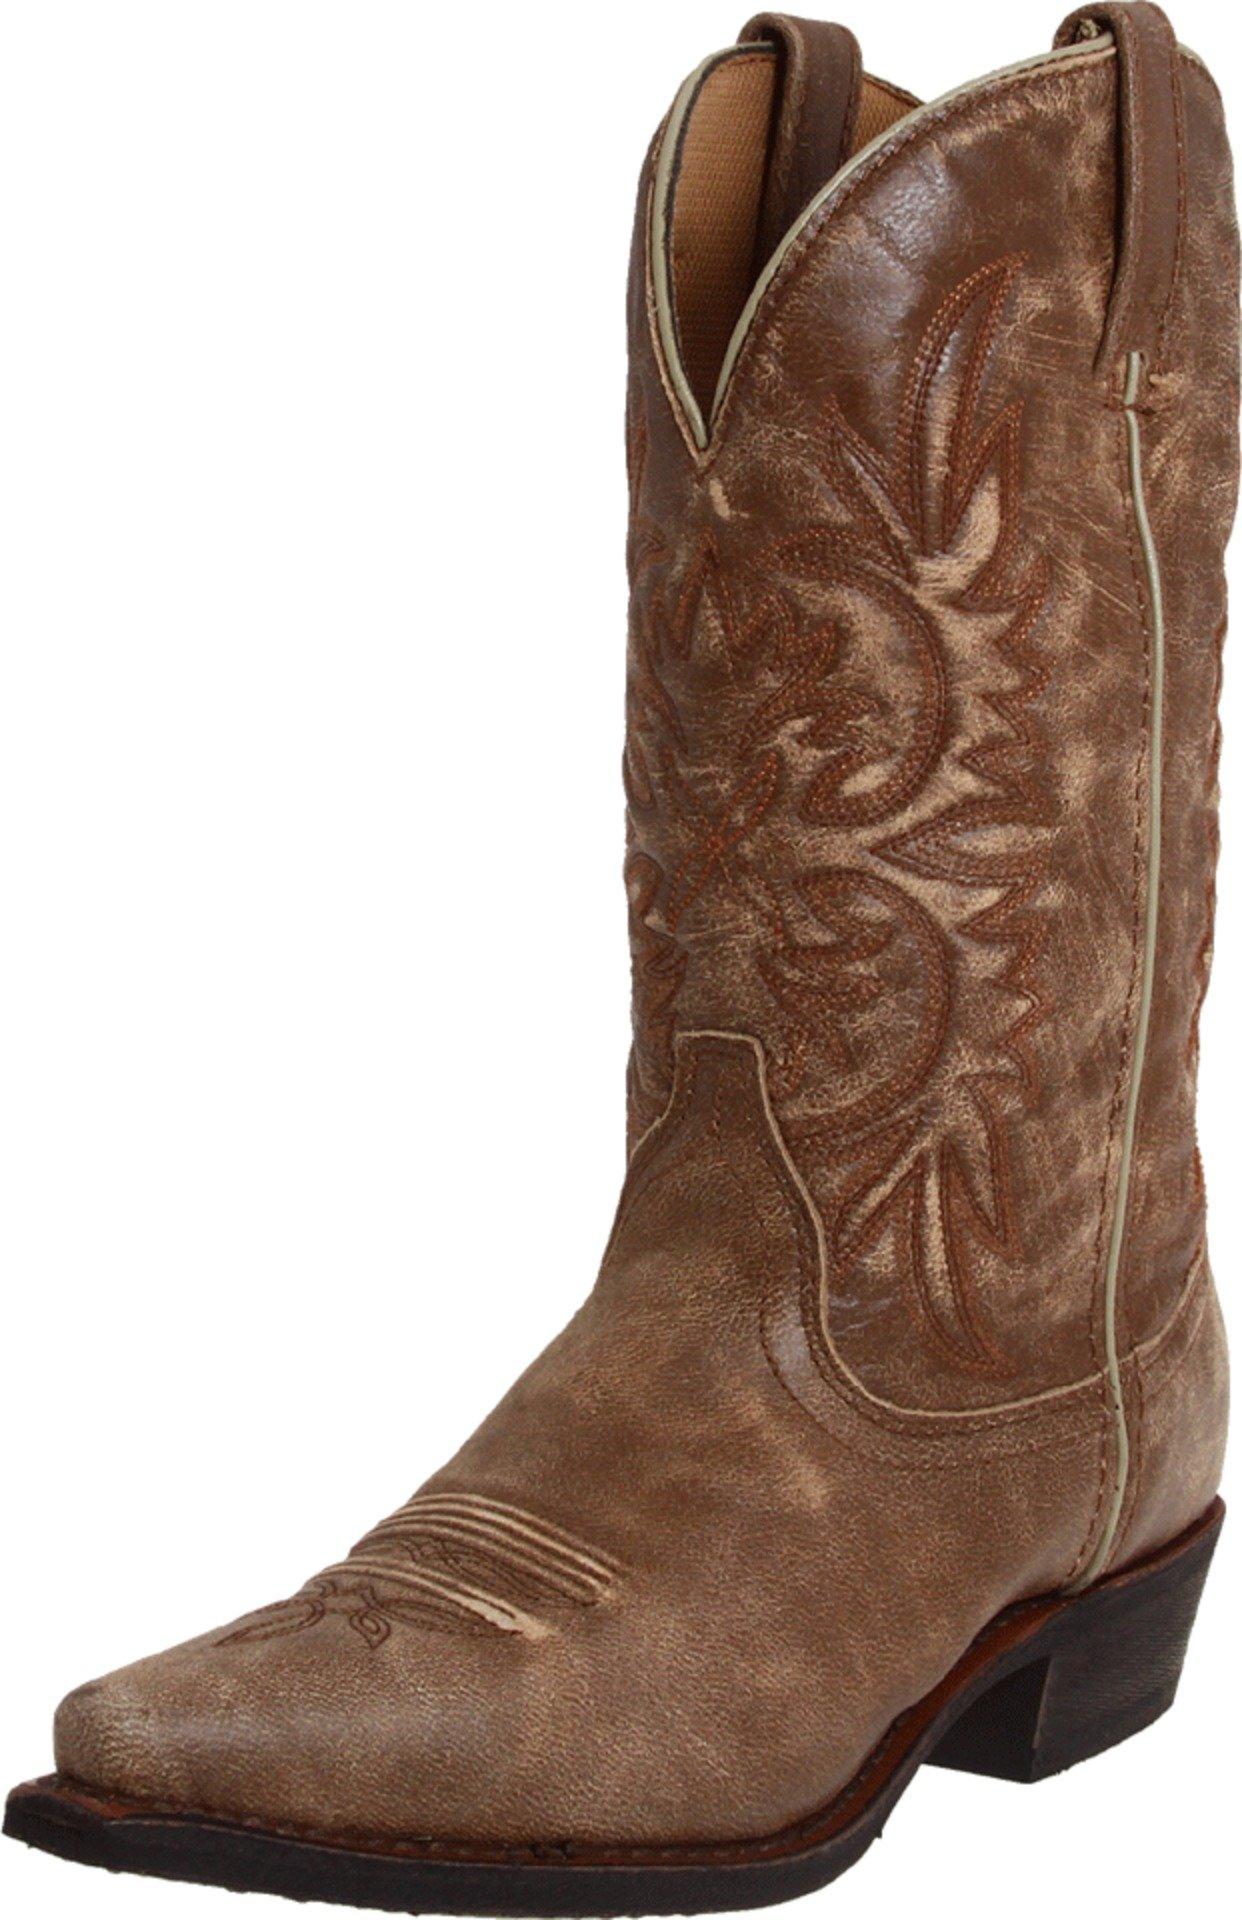 Dingo Women's Wyldwood Boot,Tan,9 M US